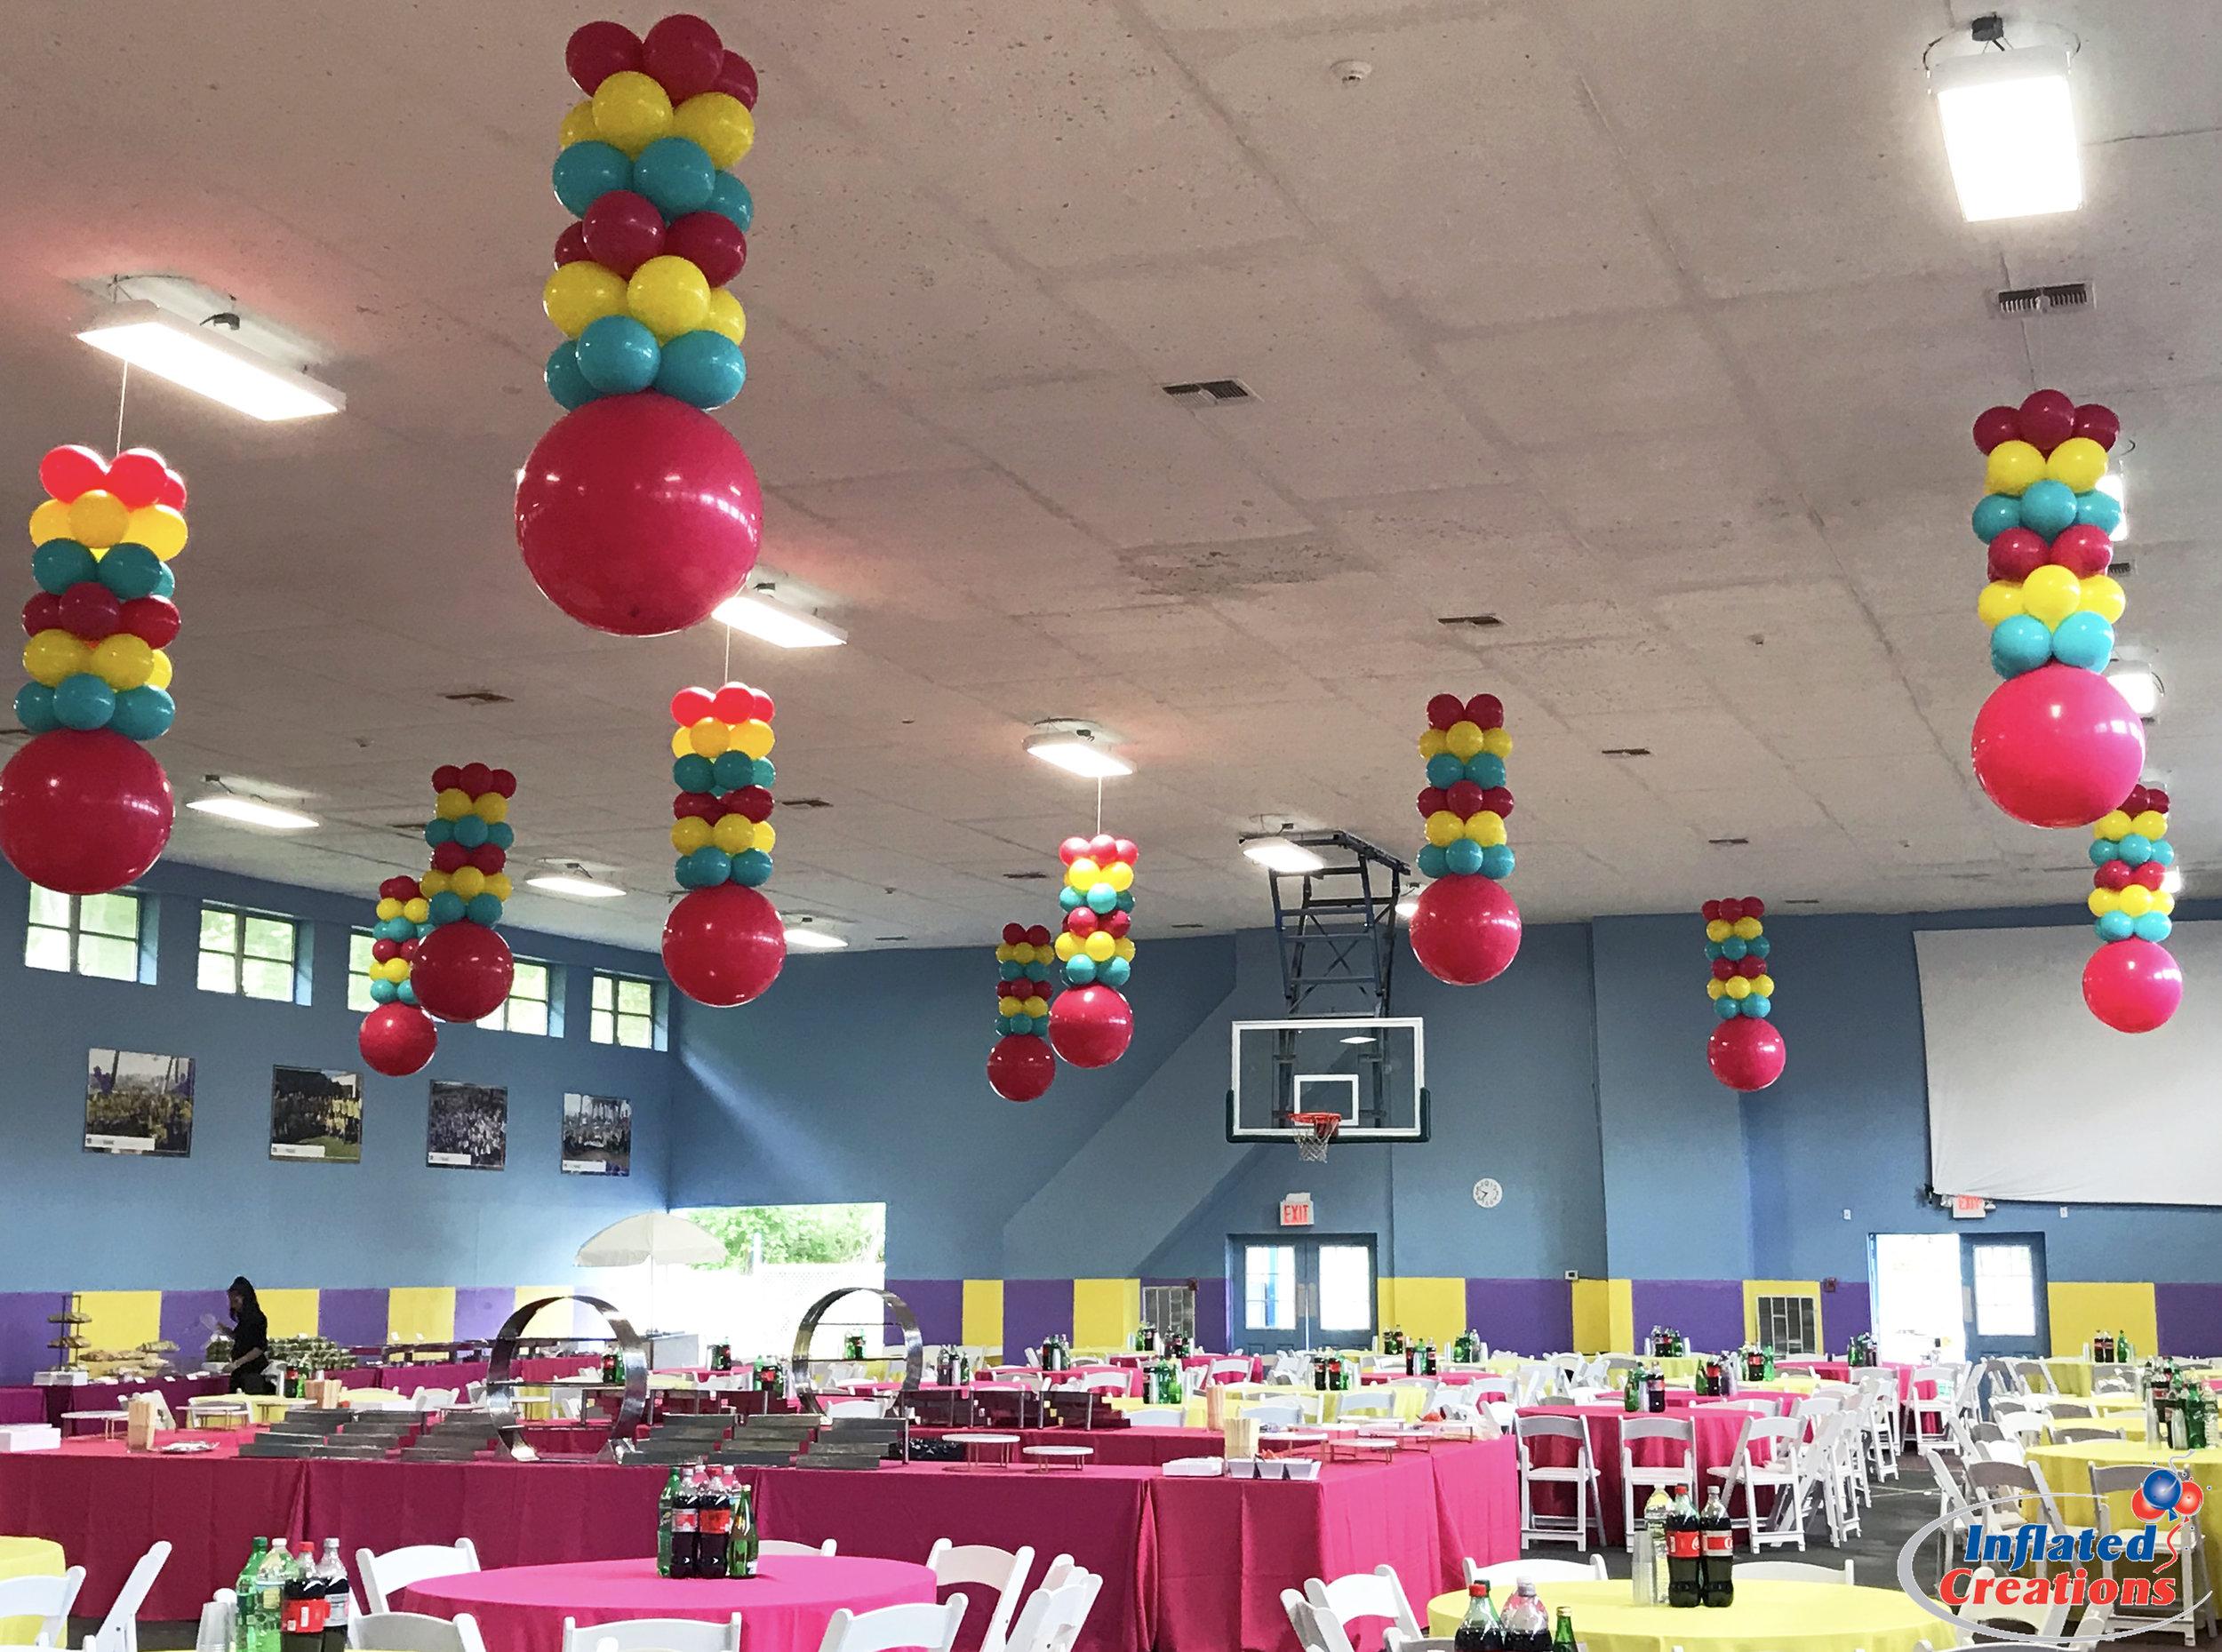 Hanging Columns